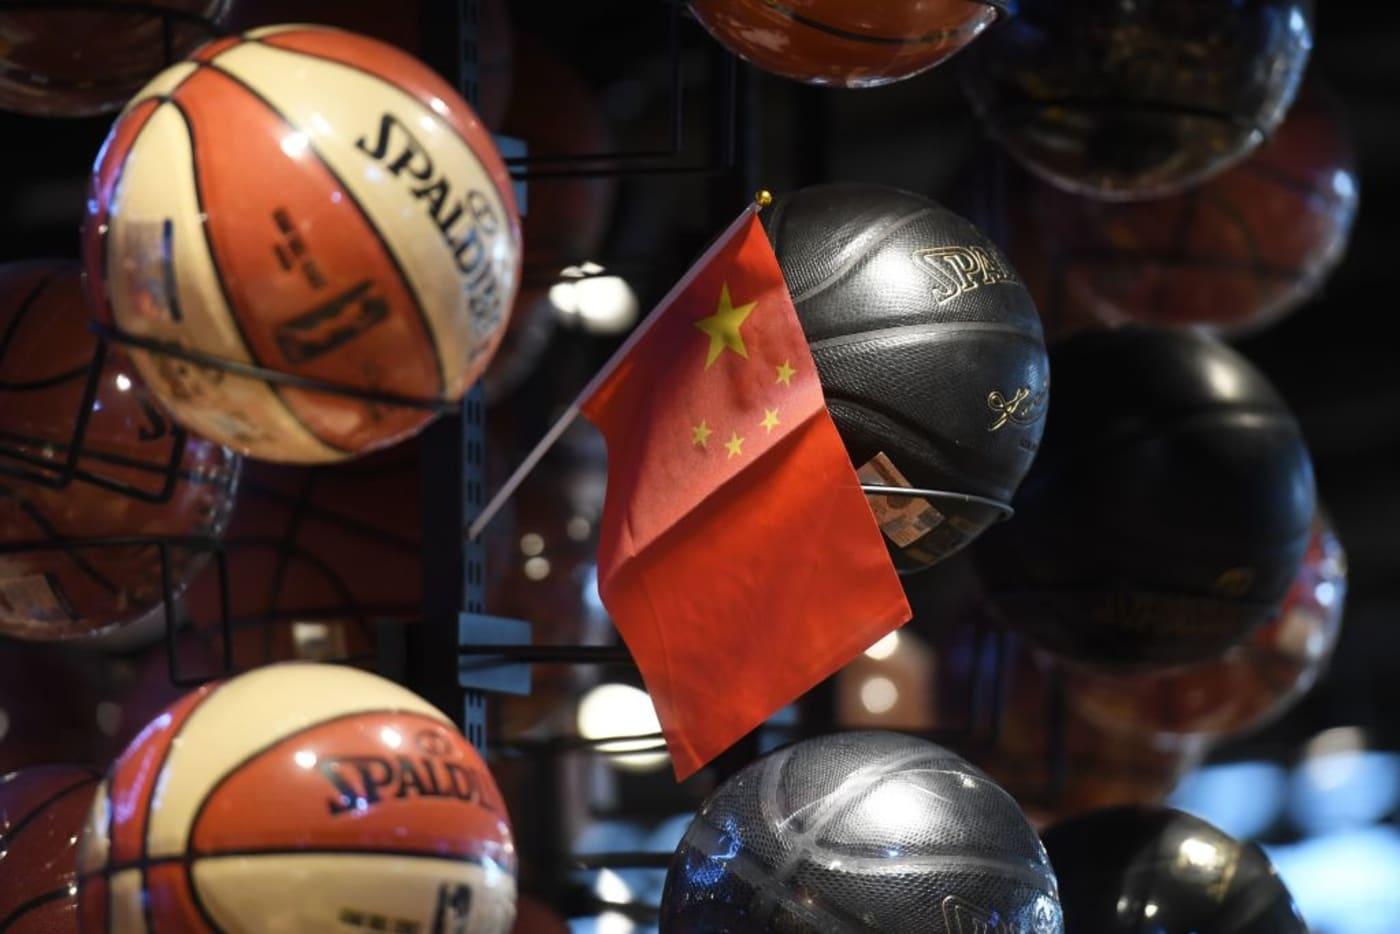 China Flag NBA Basketablls 2019 Getty